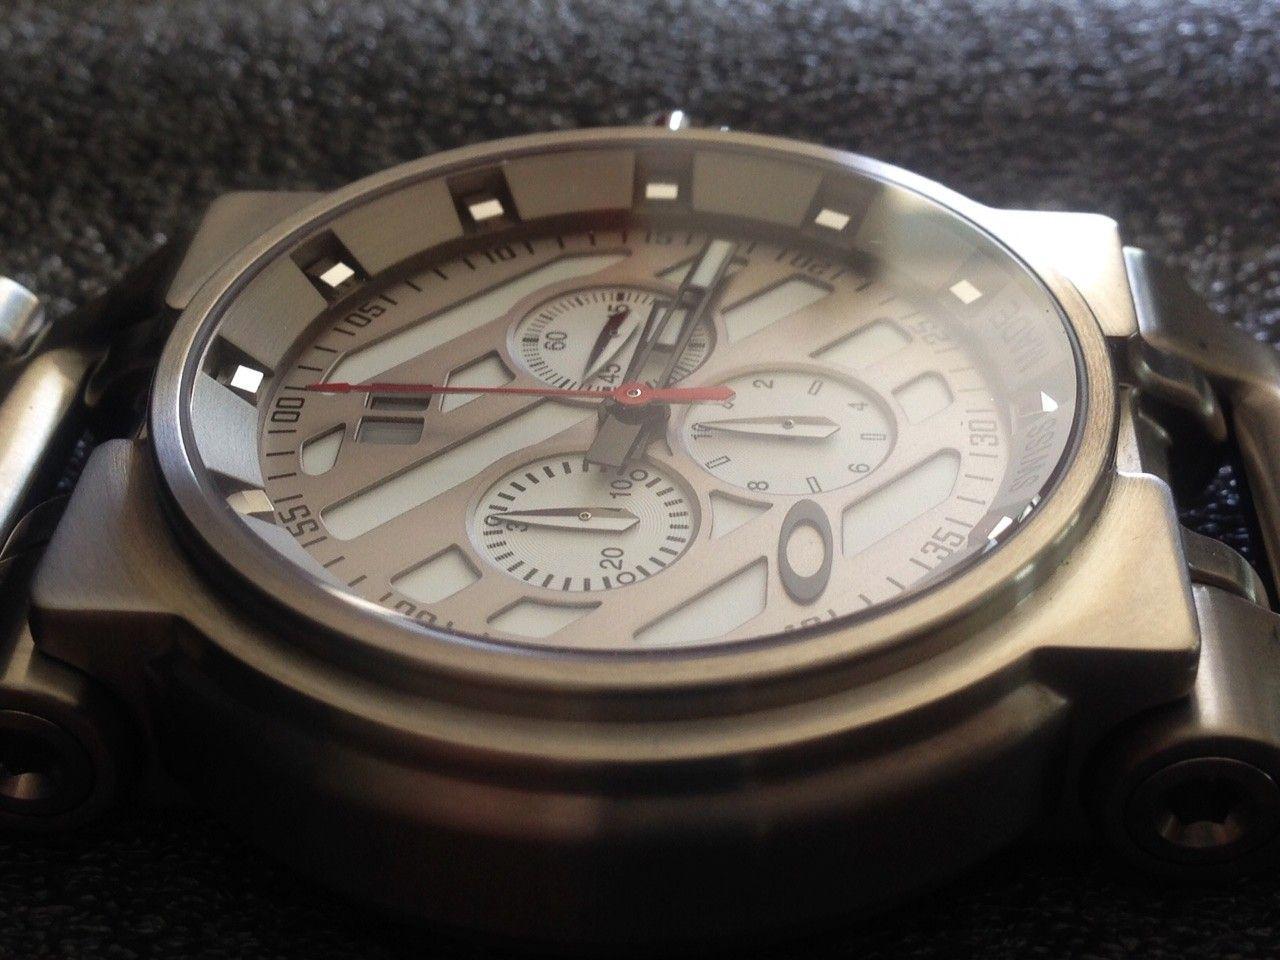 NEW IN BOX Oakley Hollow Point Titanium Watch White Dial 10-046 - 4.JPG